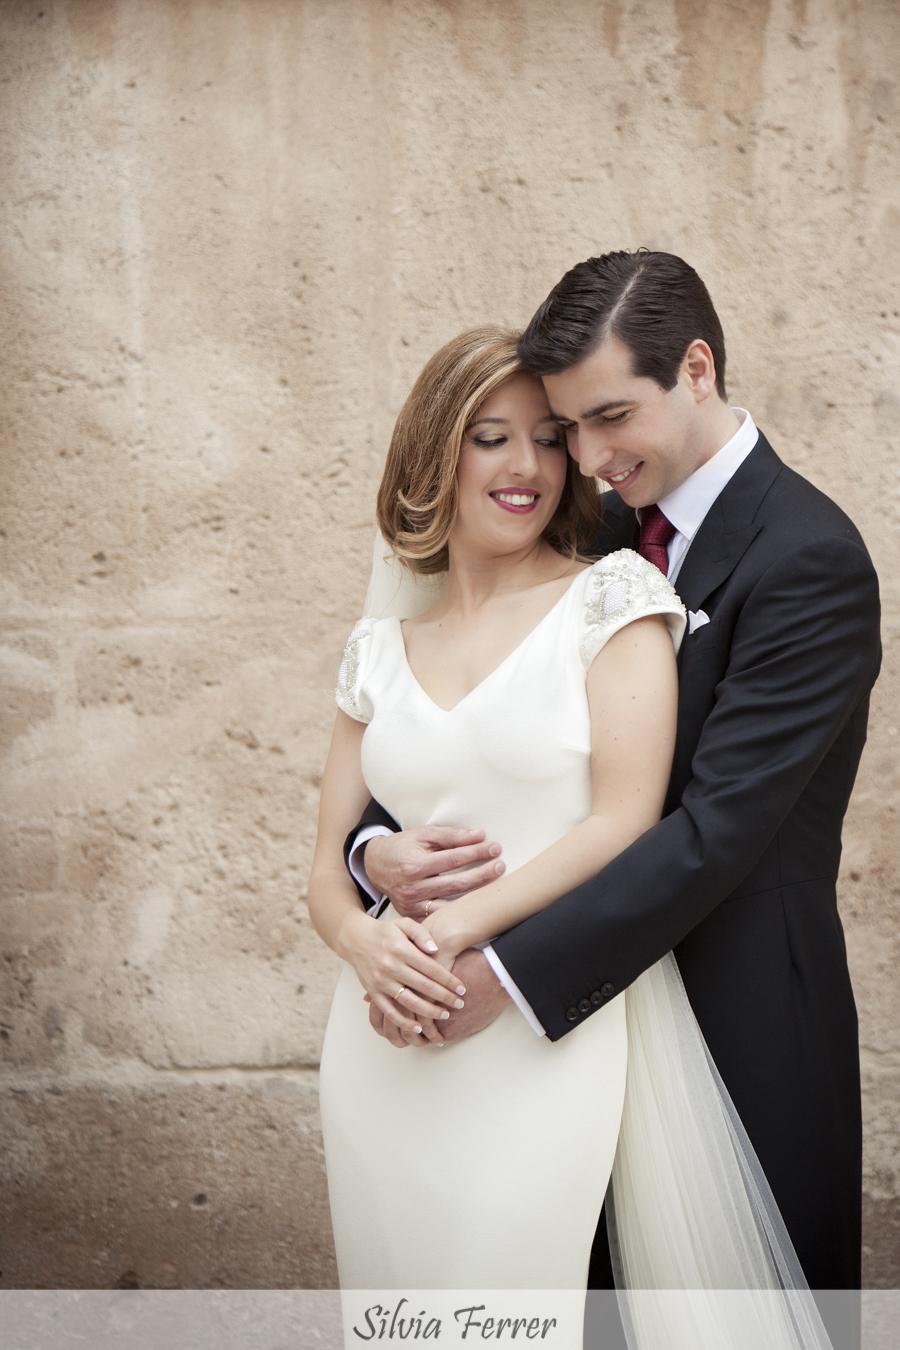 fotos de boda en murcia urbanas